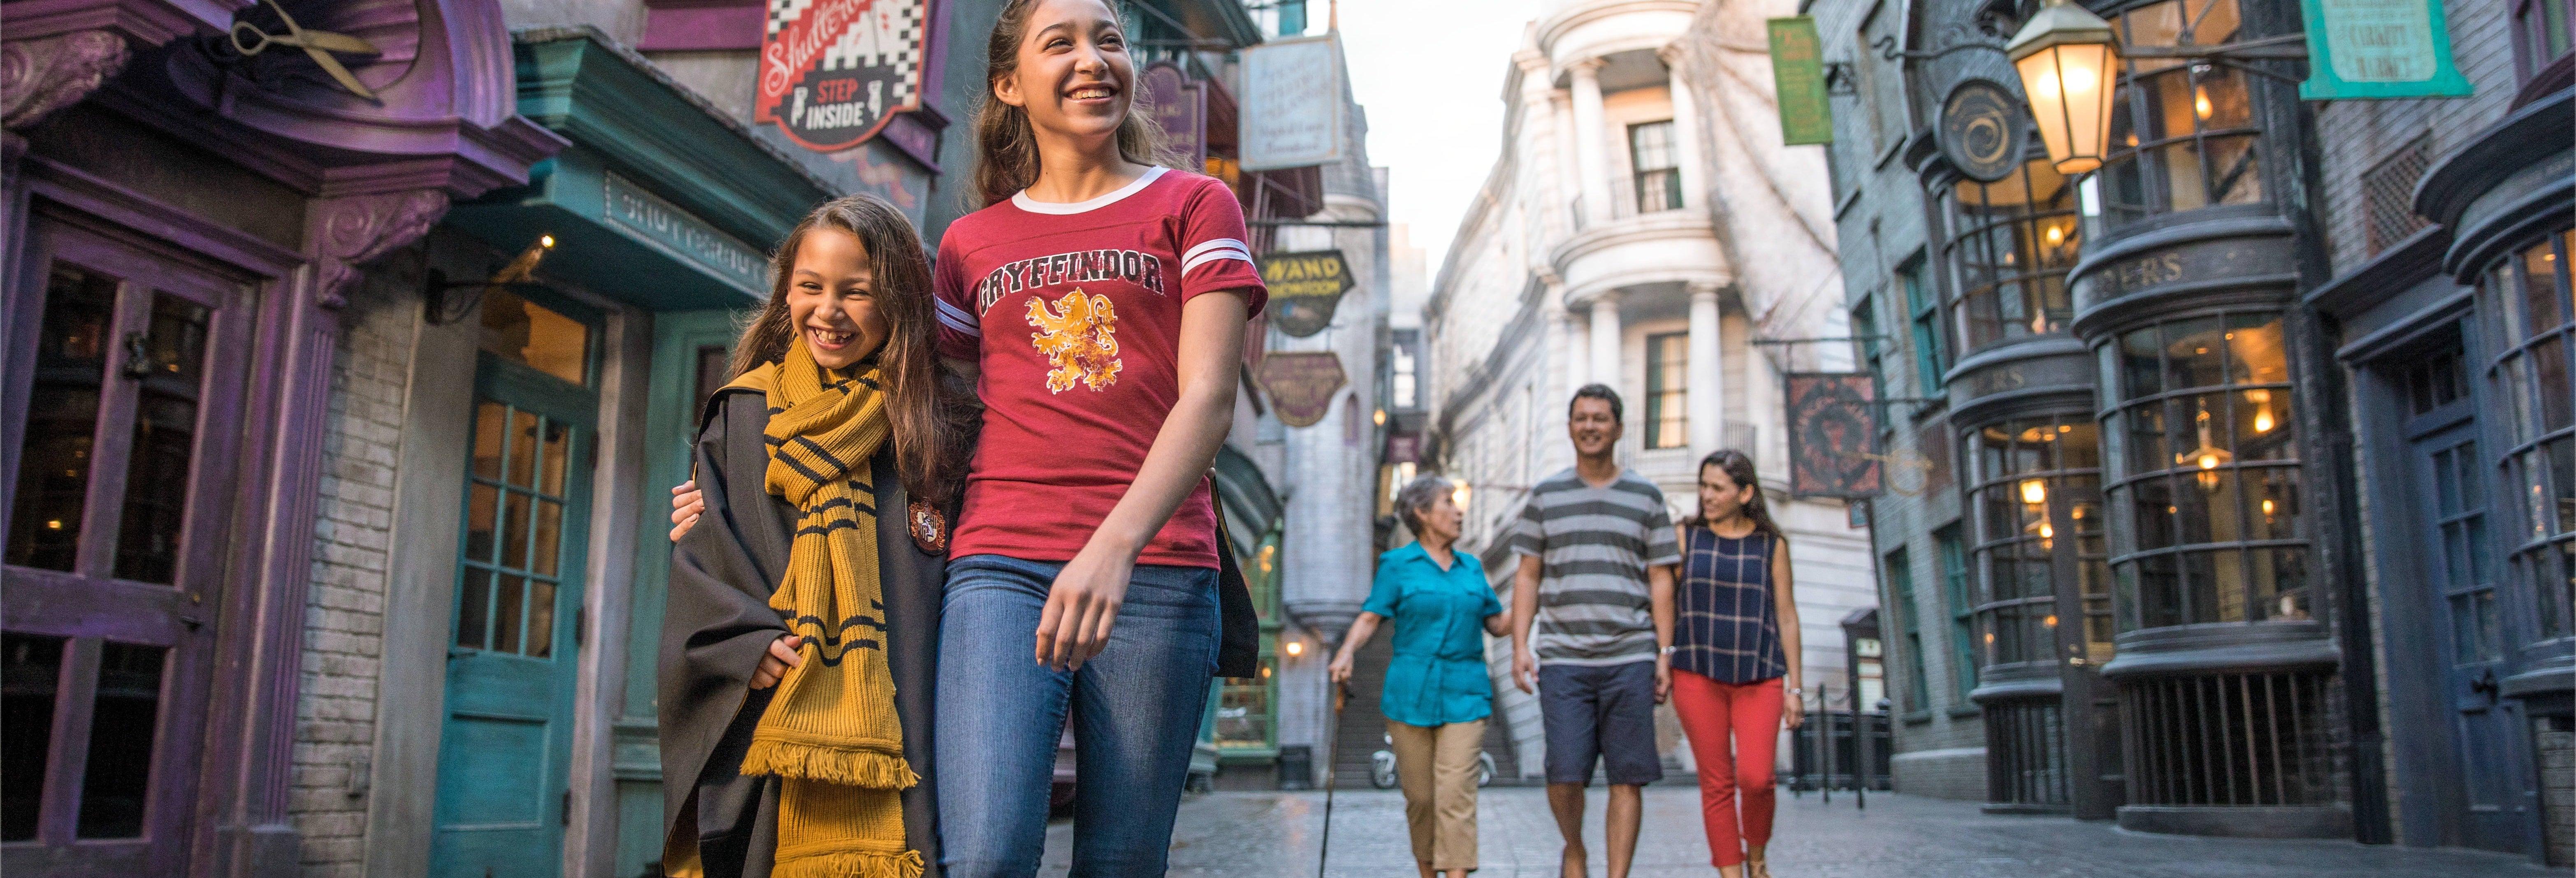 Universal Studios Orlando Day Trip